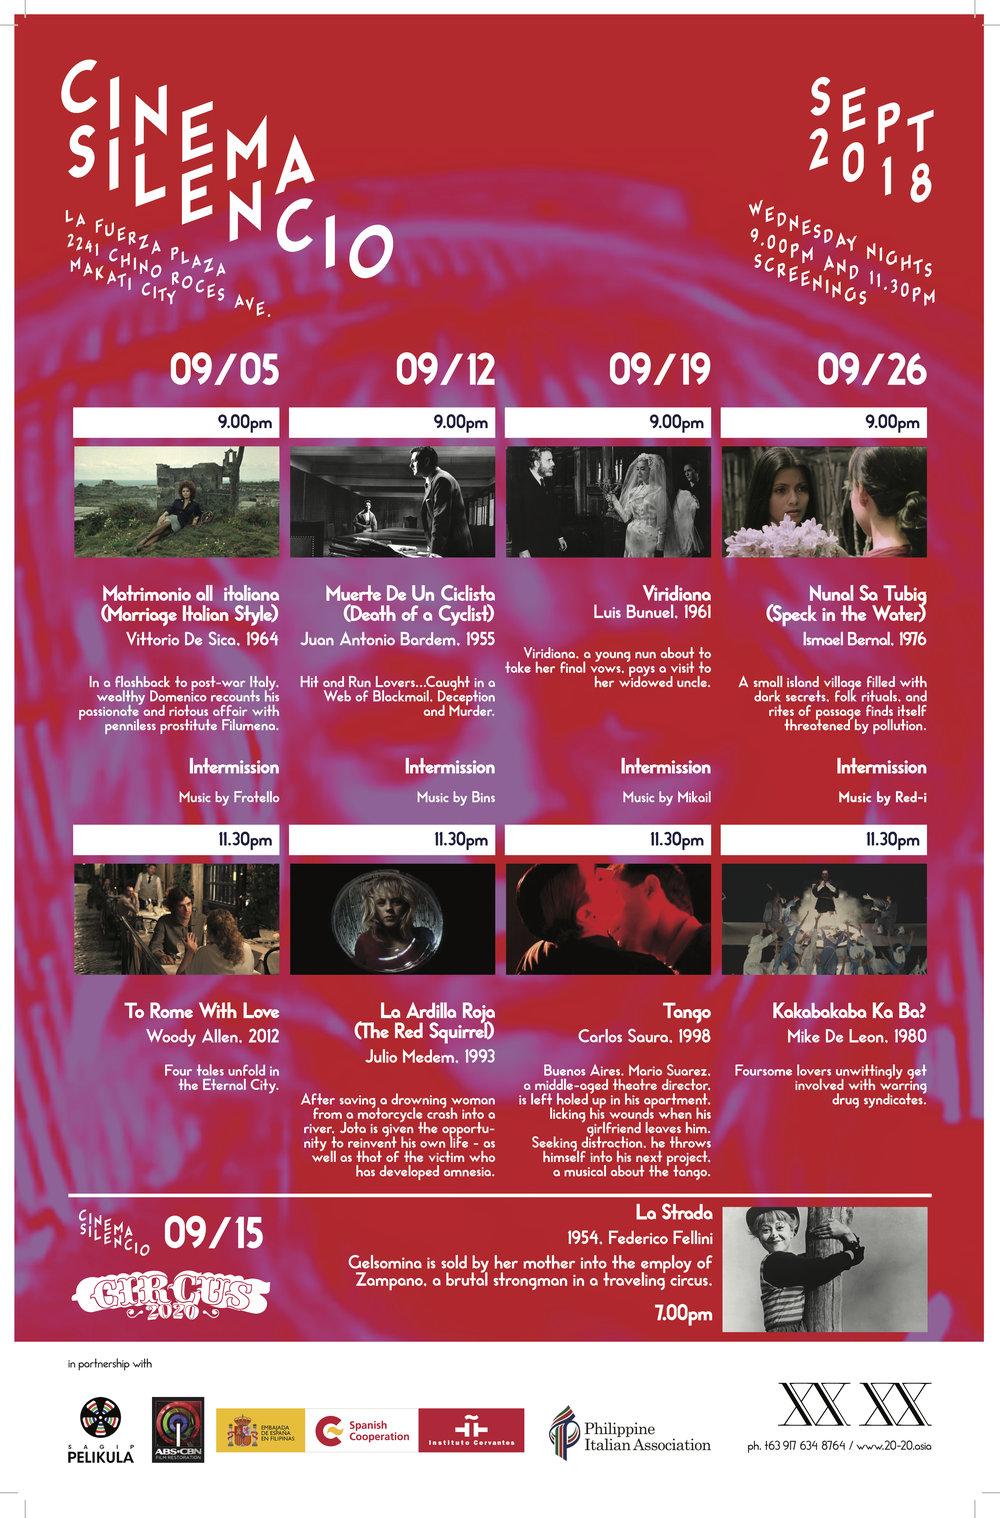 CinemaSilencio_September_Schedule.jpg